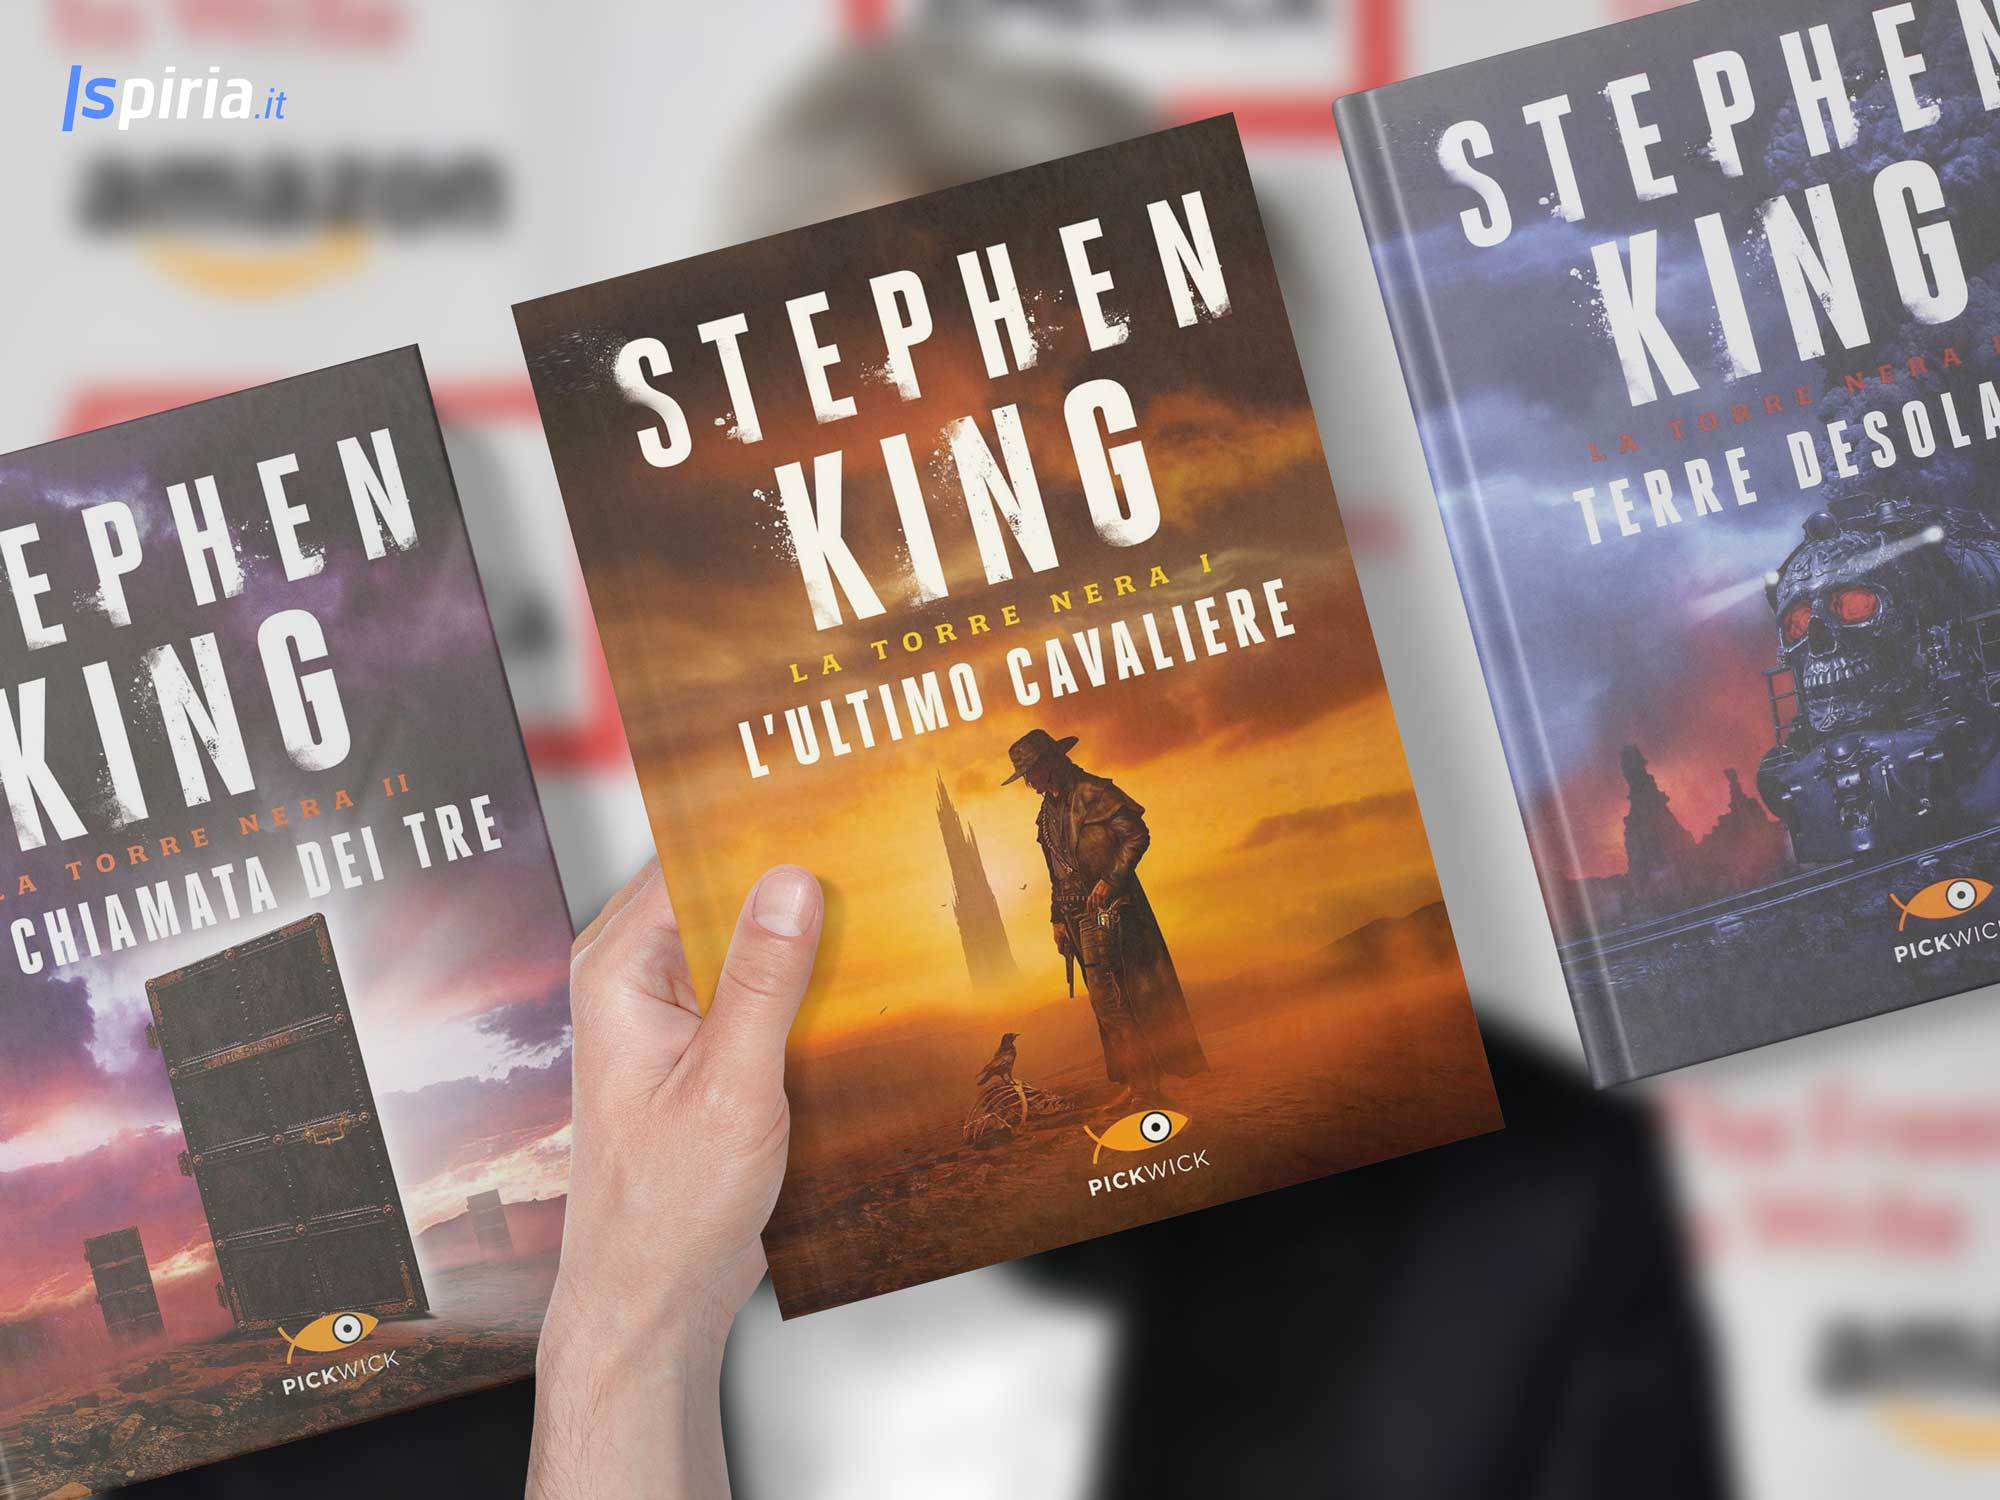 la-torre-nera-miglior-libro-fantasy-Stephen-King